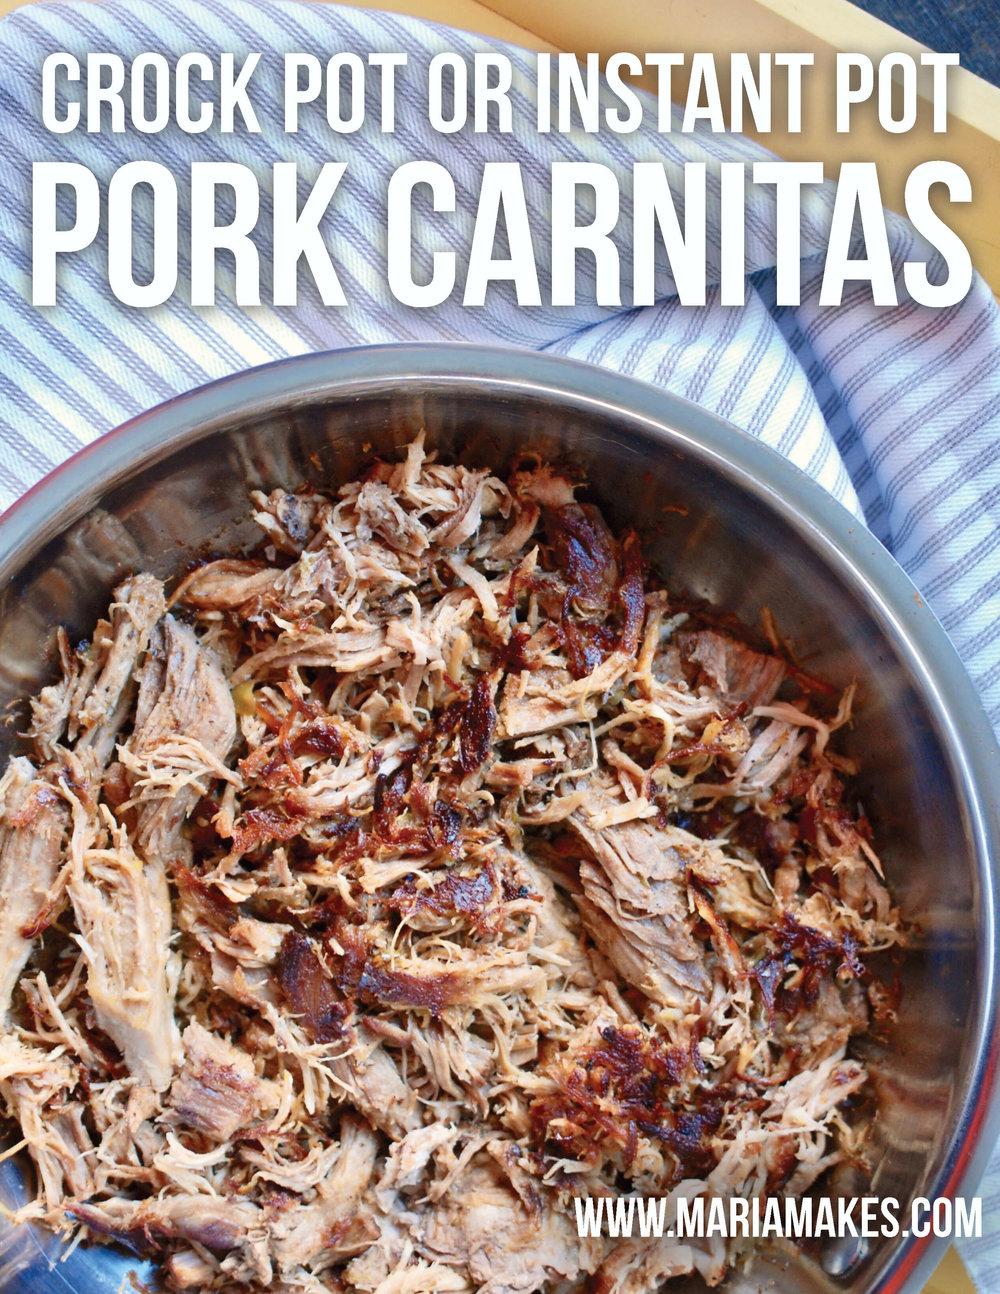 Crock Pot or Instant Pot Carnitas – Maria Makes: Perfectly seasoned, crispy pork carnitas. The perfect muti-purpose protein for tacos, bowls, salads, you name it!